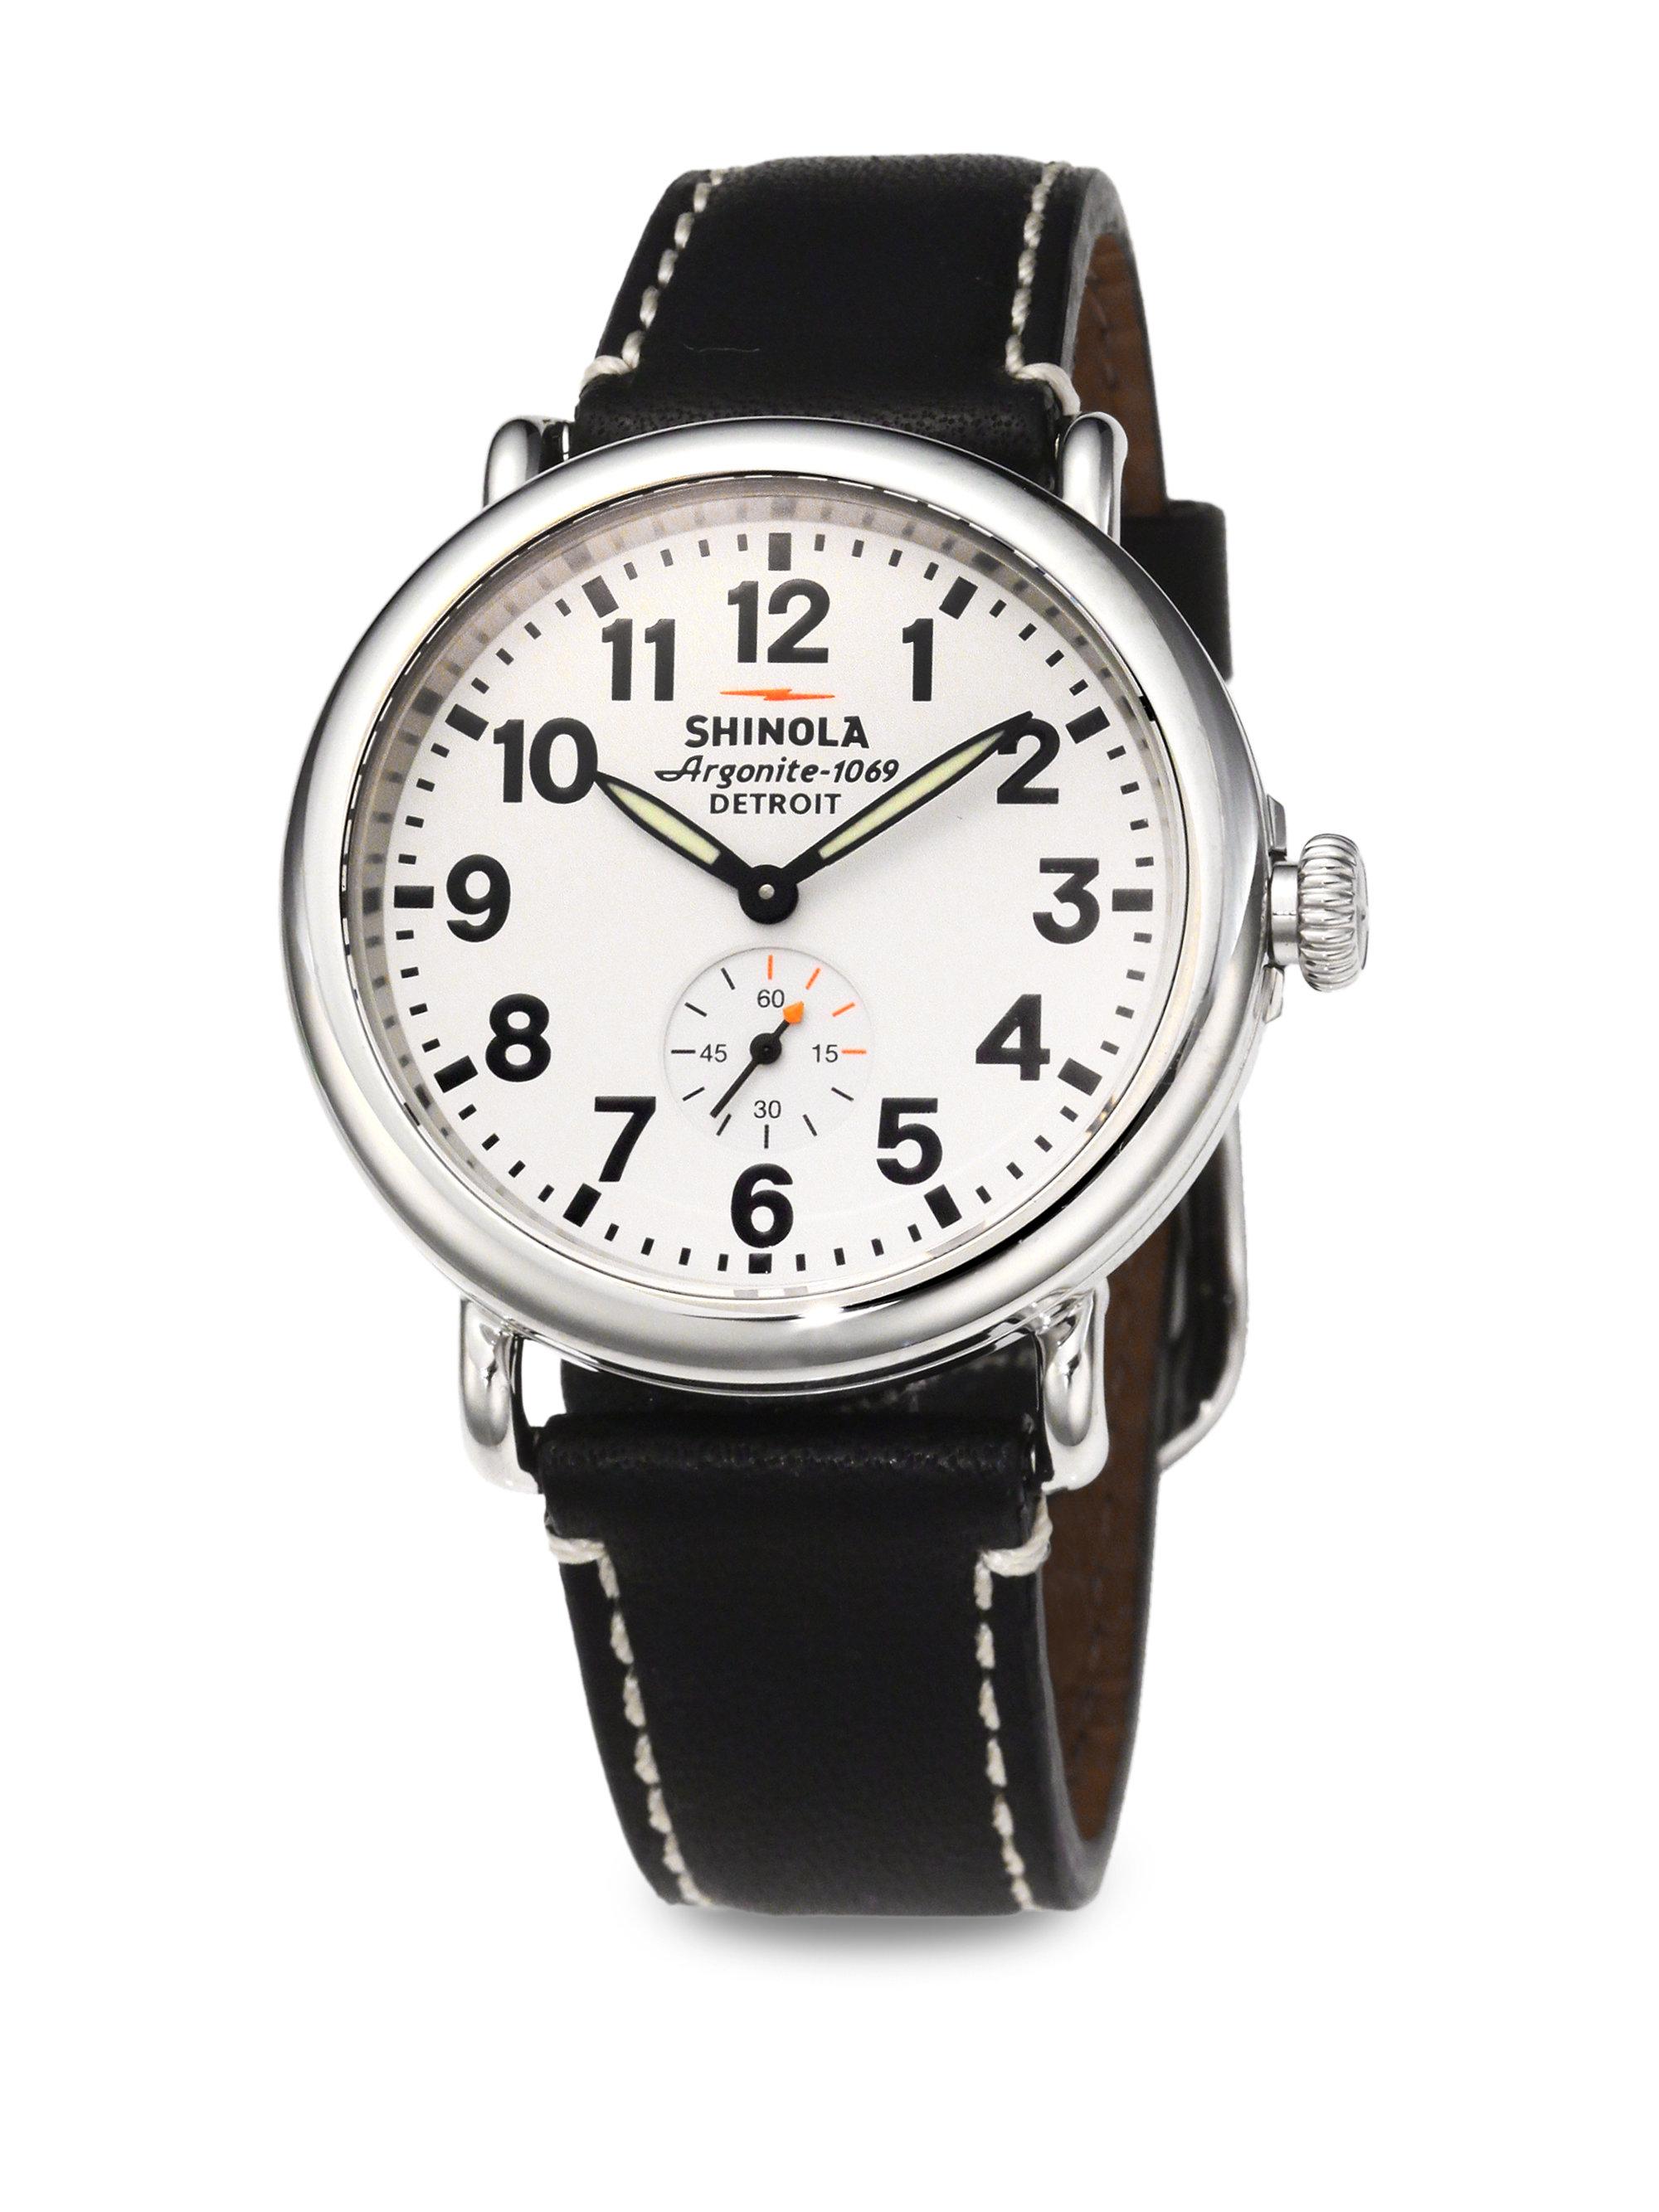 Shinola runwell stainless steel watch in black for men stainless steel black lyst for Shinola watches